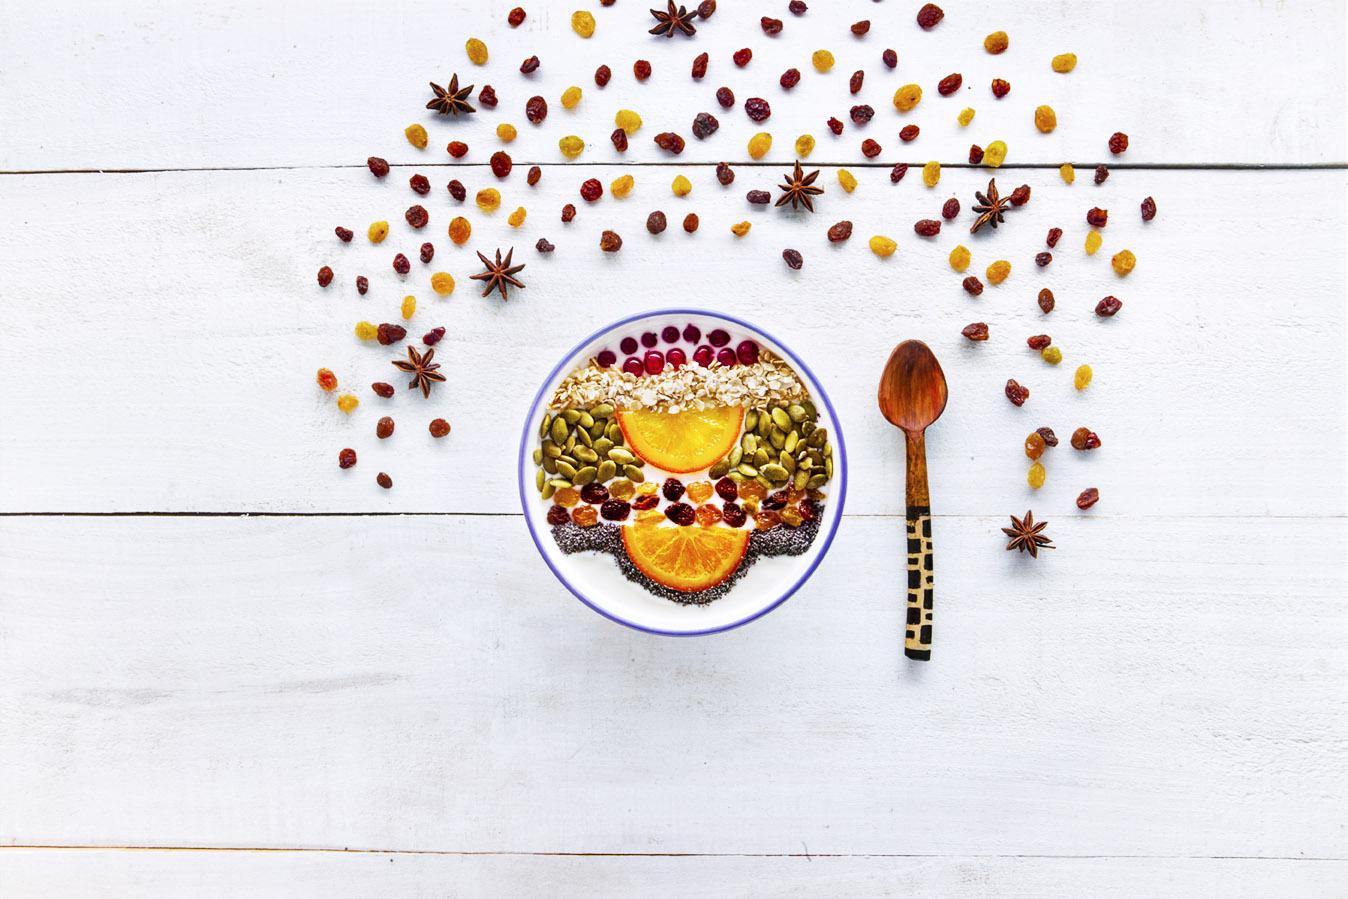 Kaiku-Sin-Lactosa-Recetas-Sanas-Smoothie-Bowl